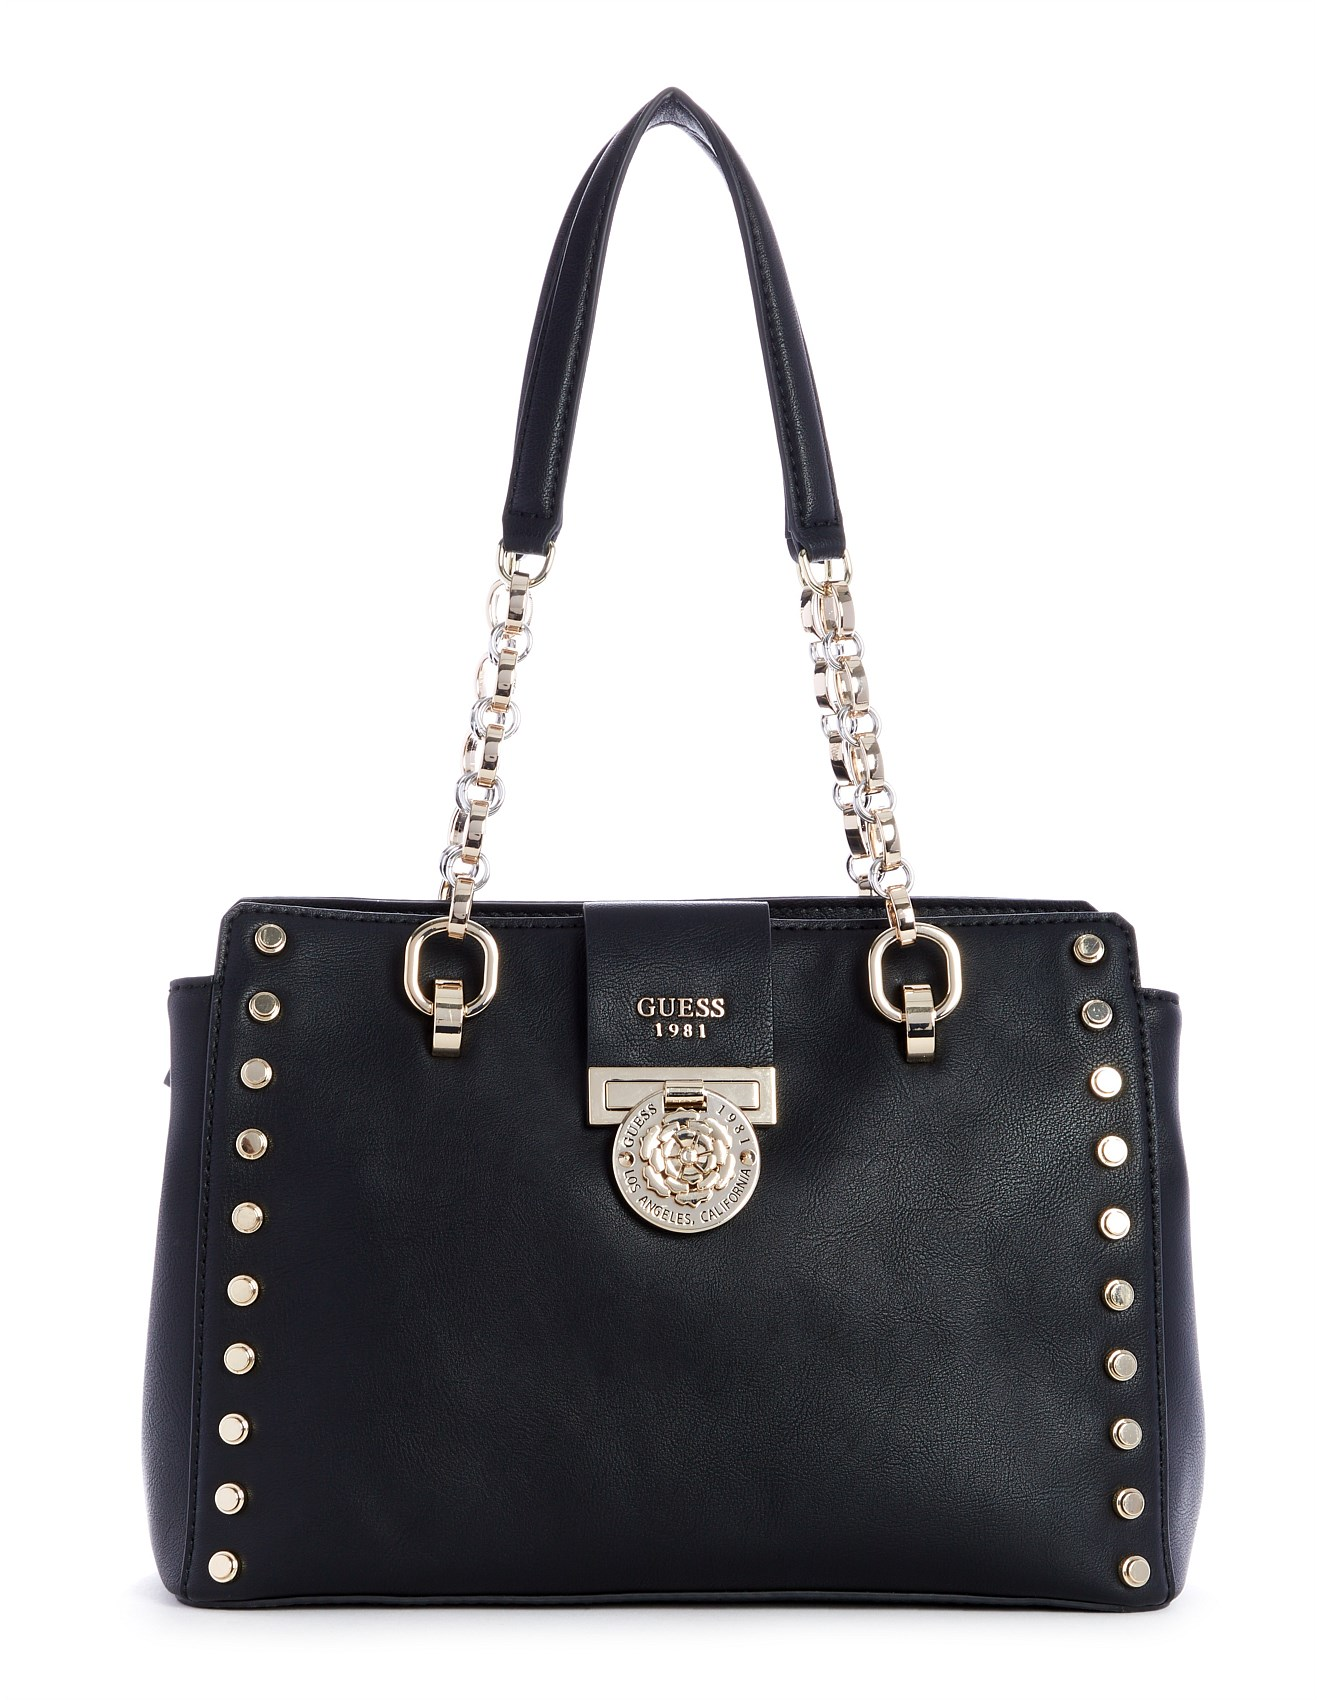 Designer Handbags For Women  023fcb96cf8d8